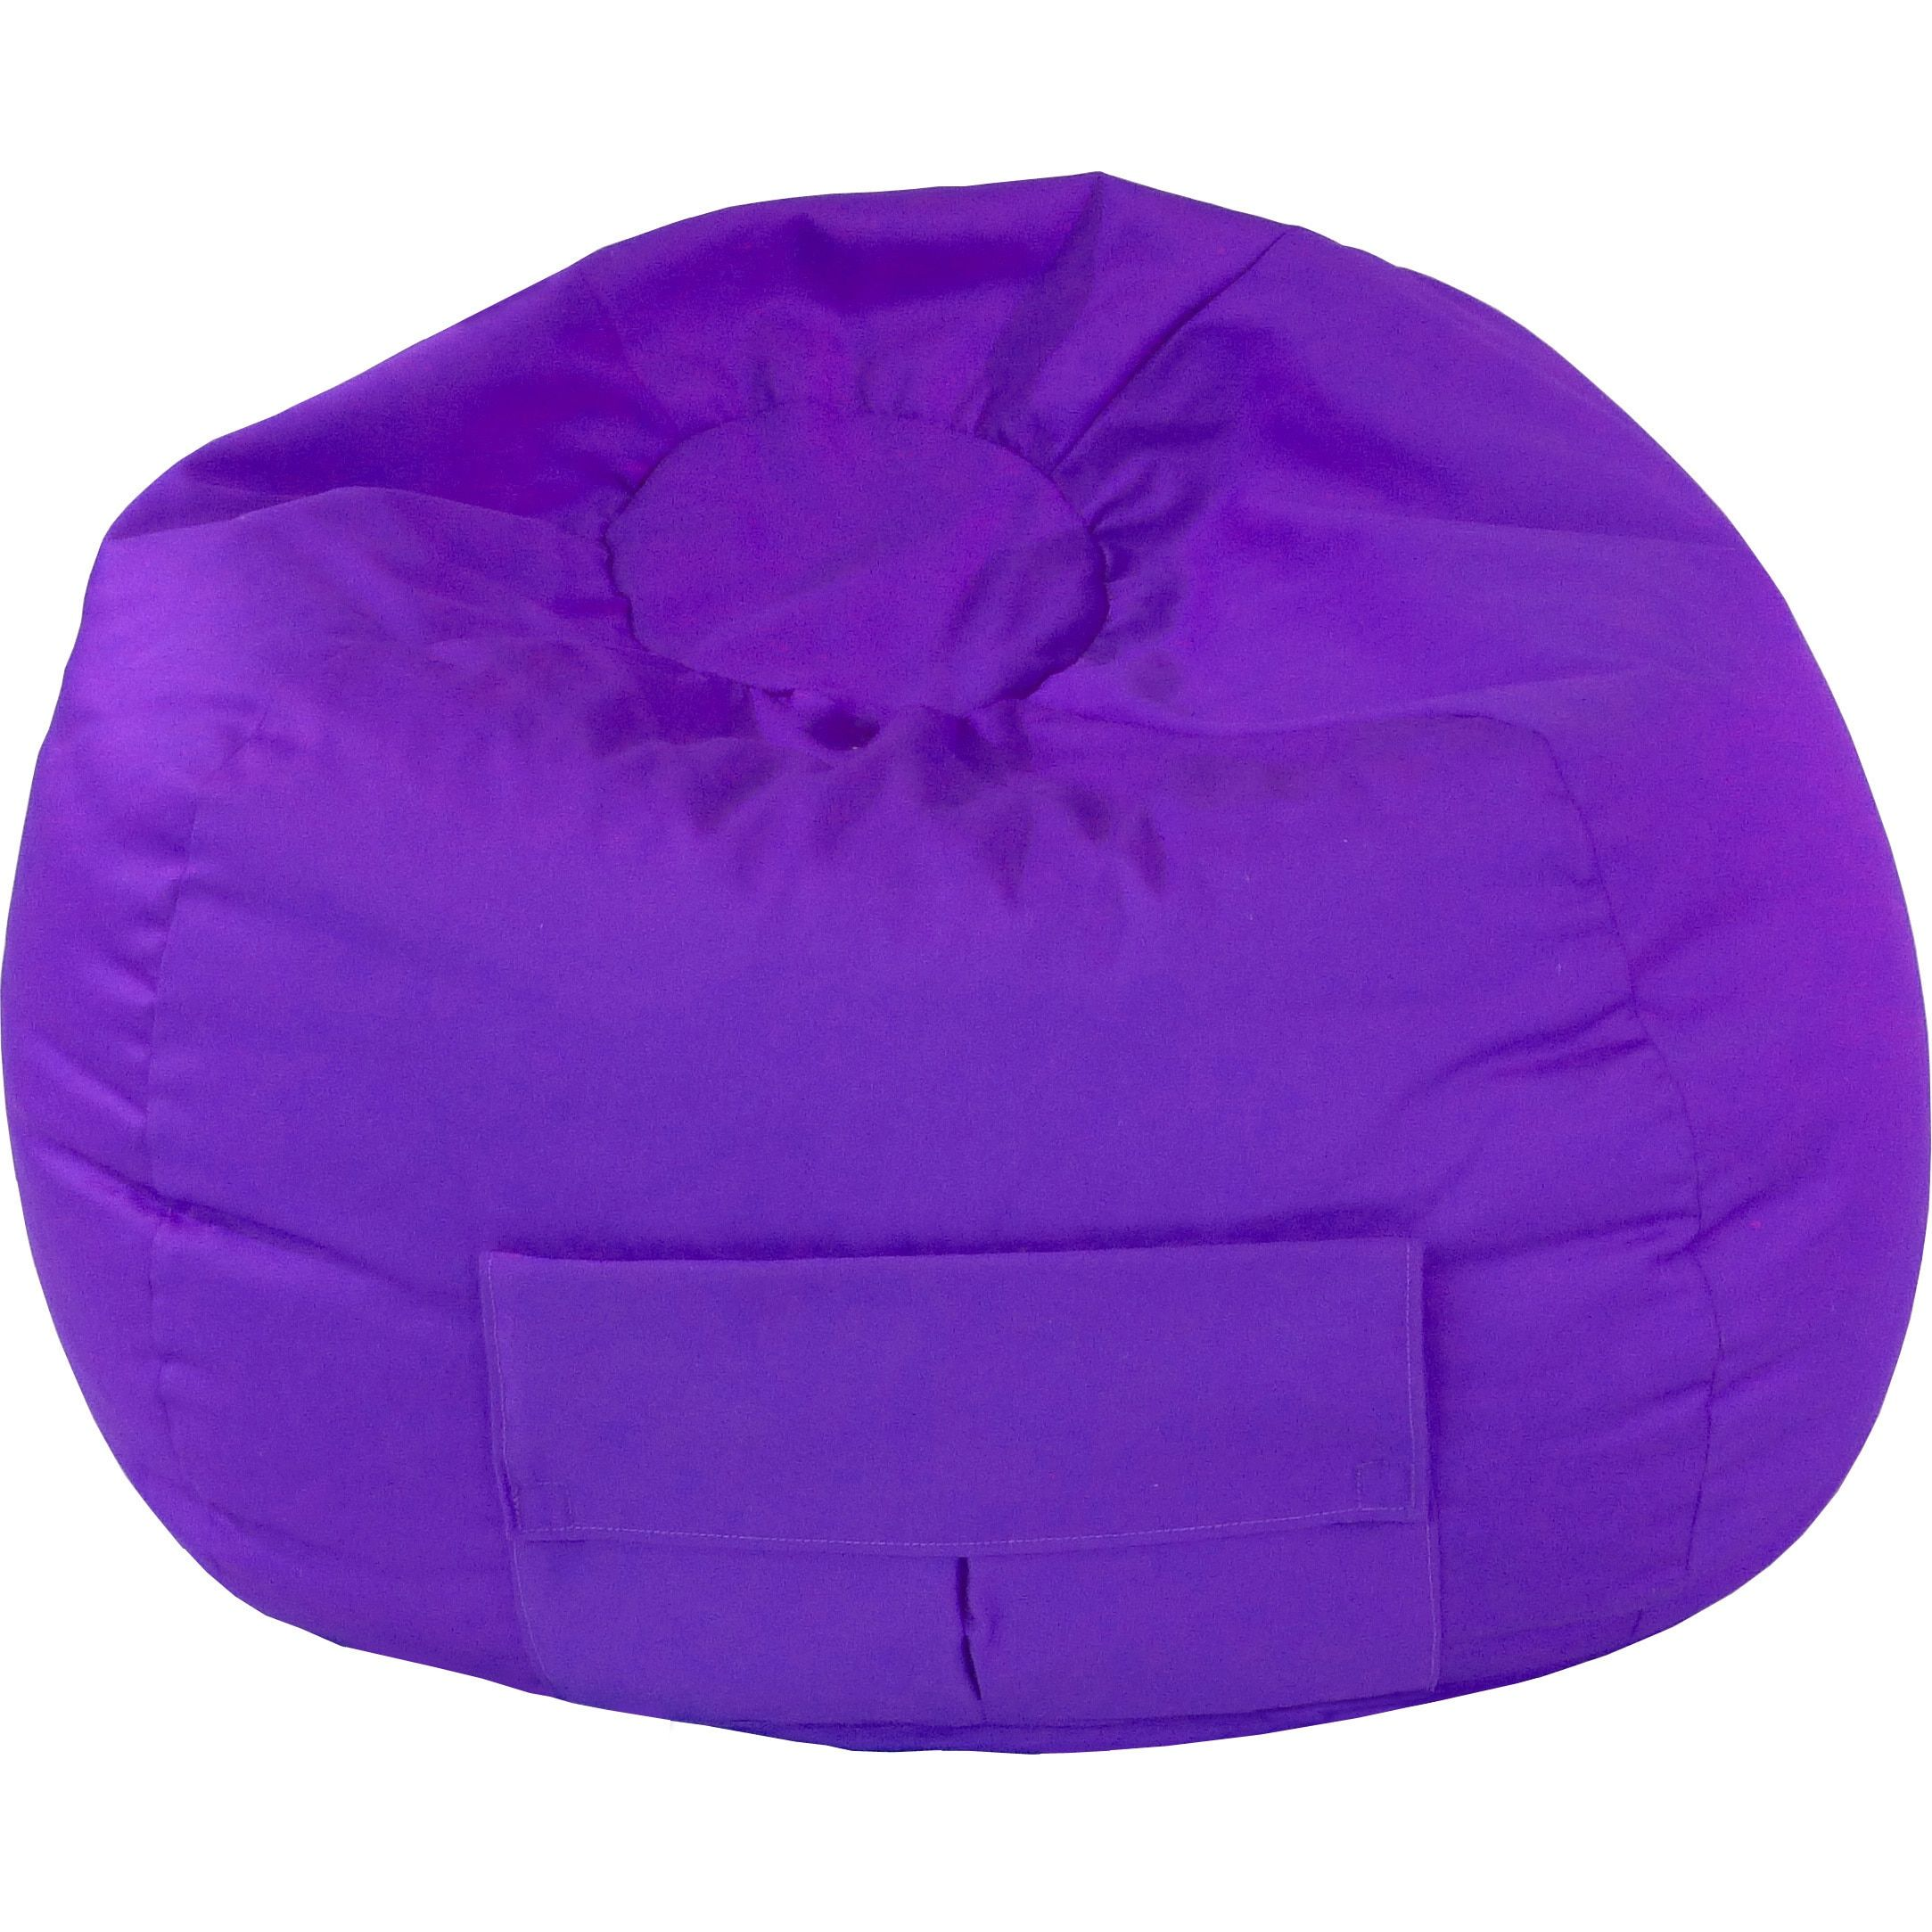 Groovy Gold Medal Hudson Industries Kids Bean Bag Everything Beatyapartments Chair Design Images Beatyapartmentscom